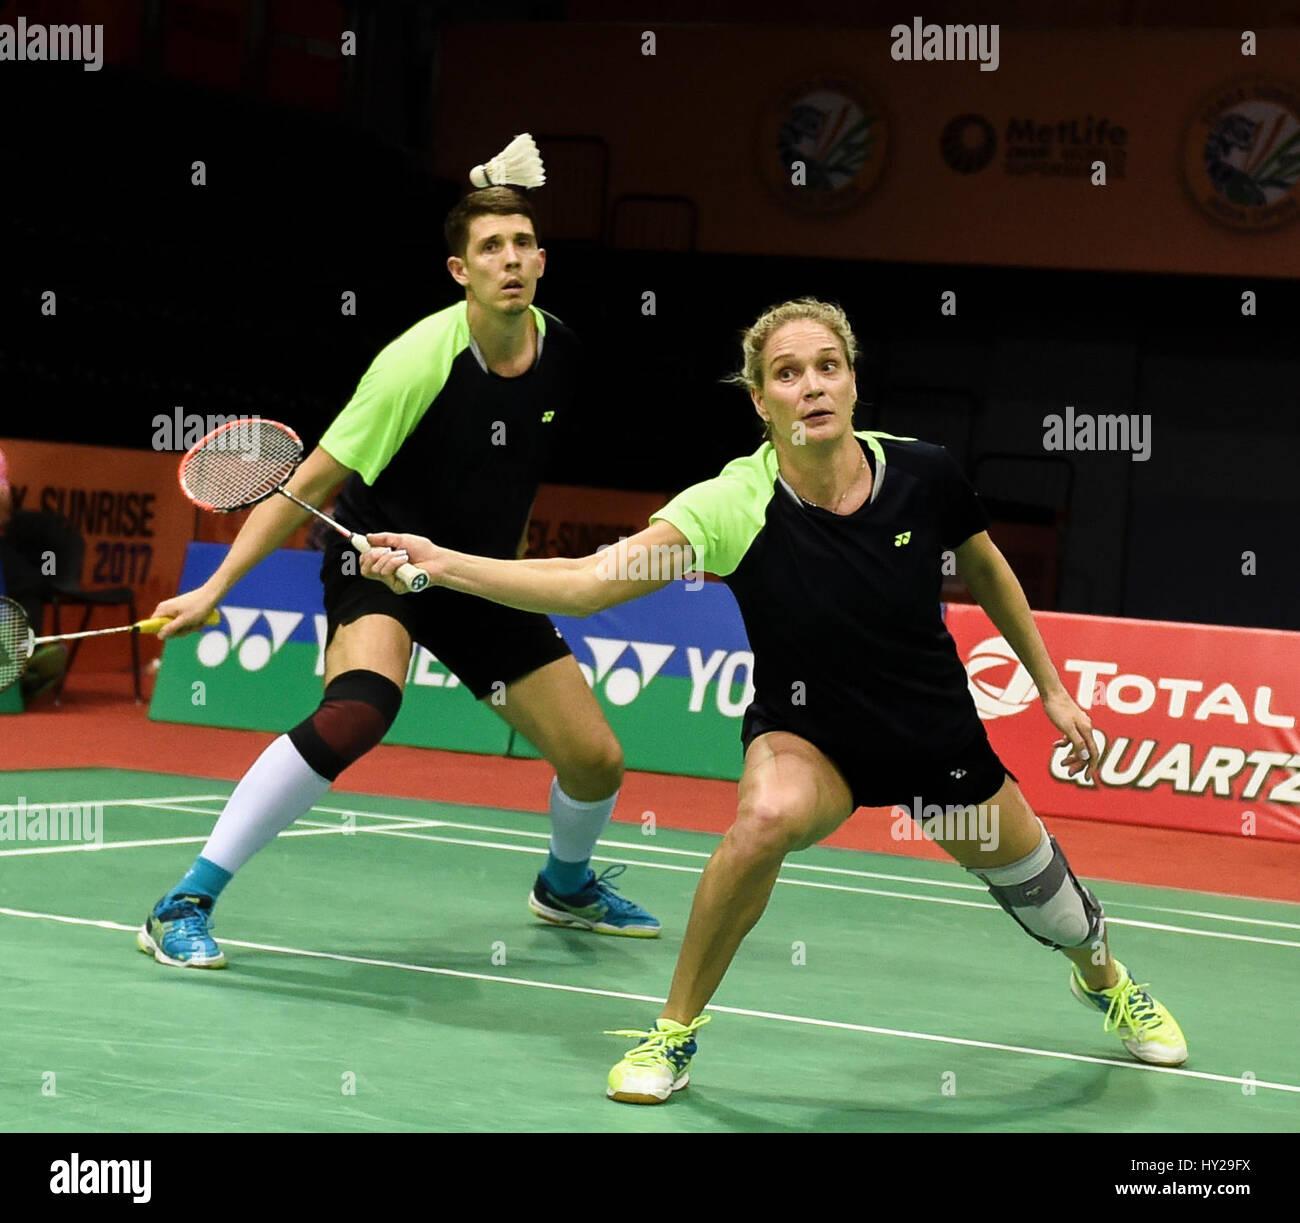 New Delhi India 31st Mar 2017 Evgenij Dremin and Evgenia